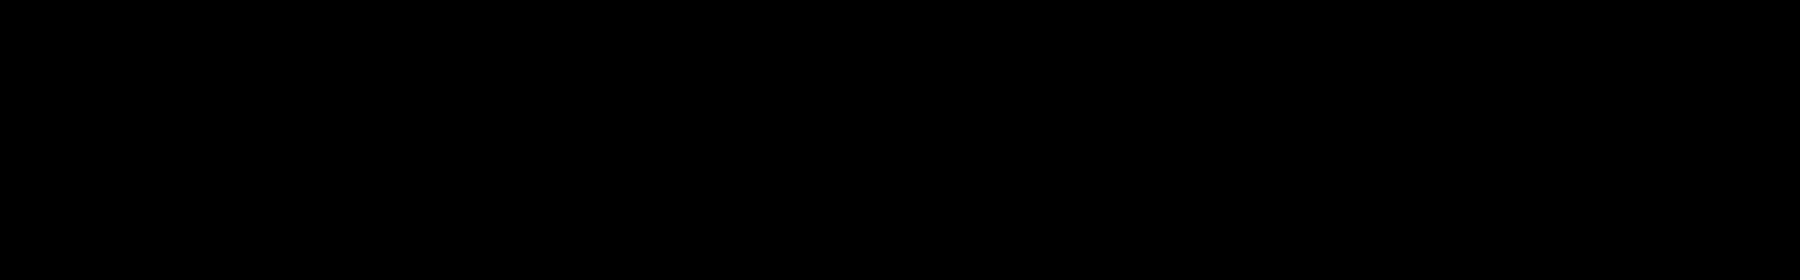 IMMIDIATE - Synthwave audio waveform